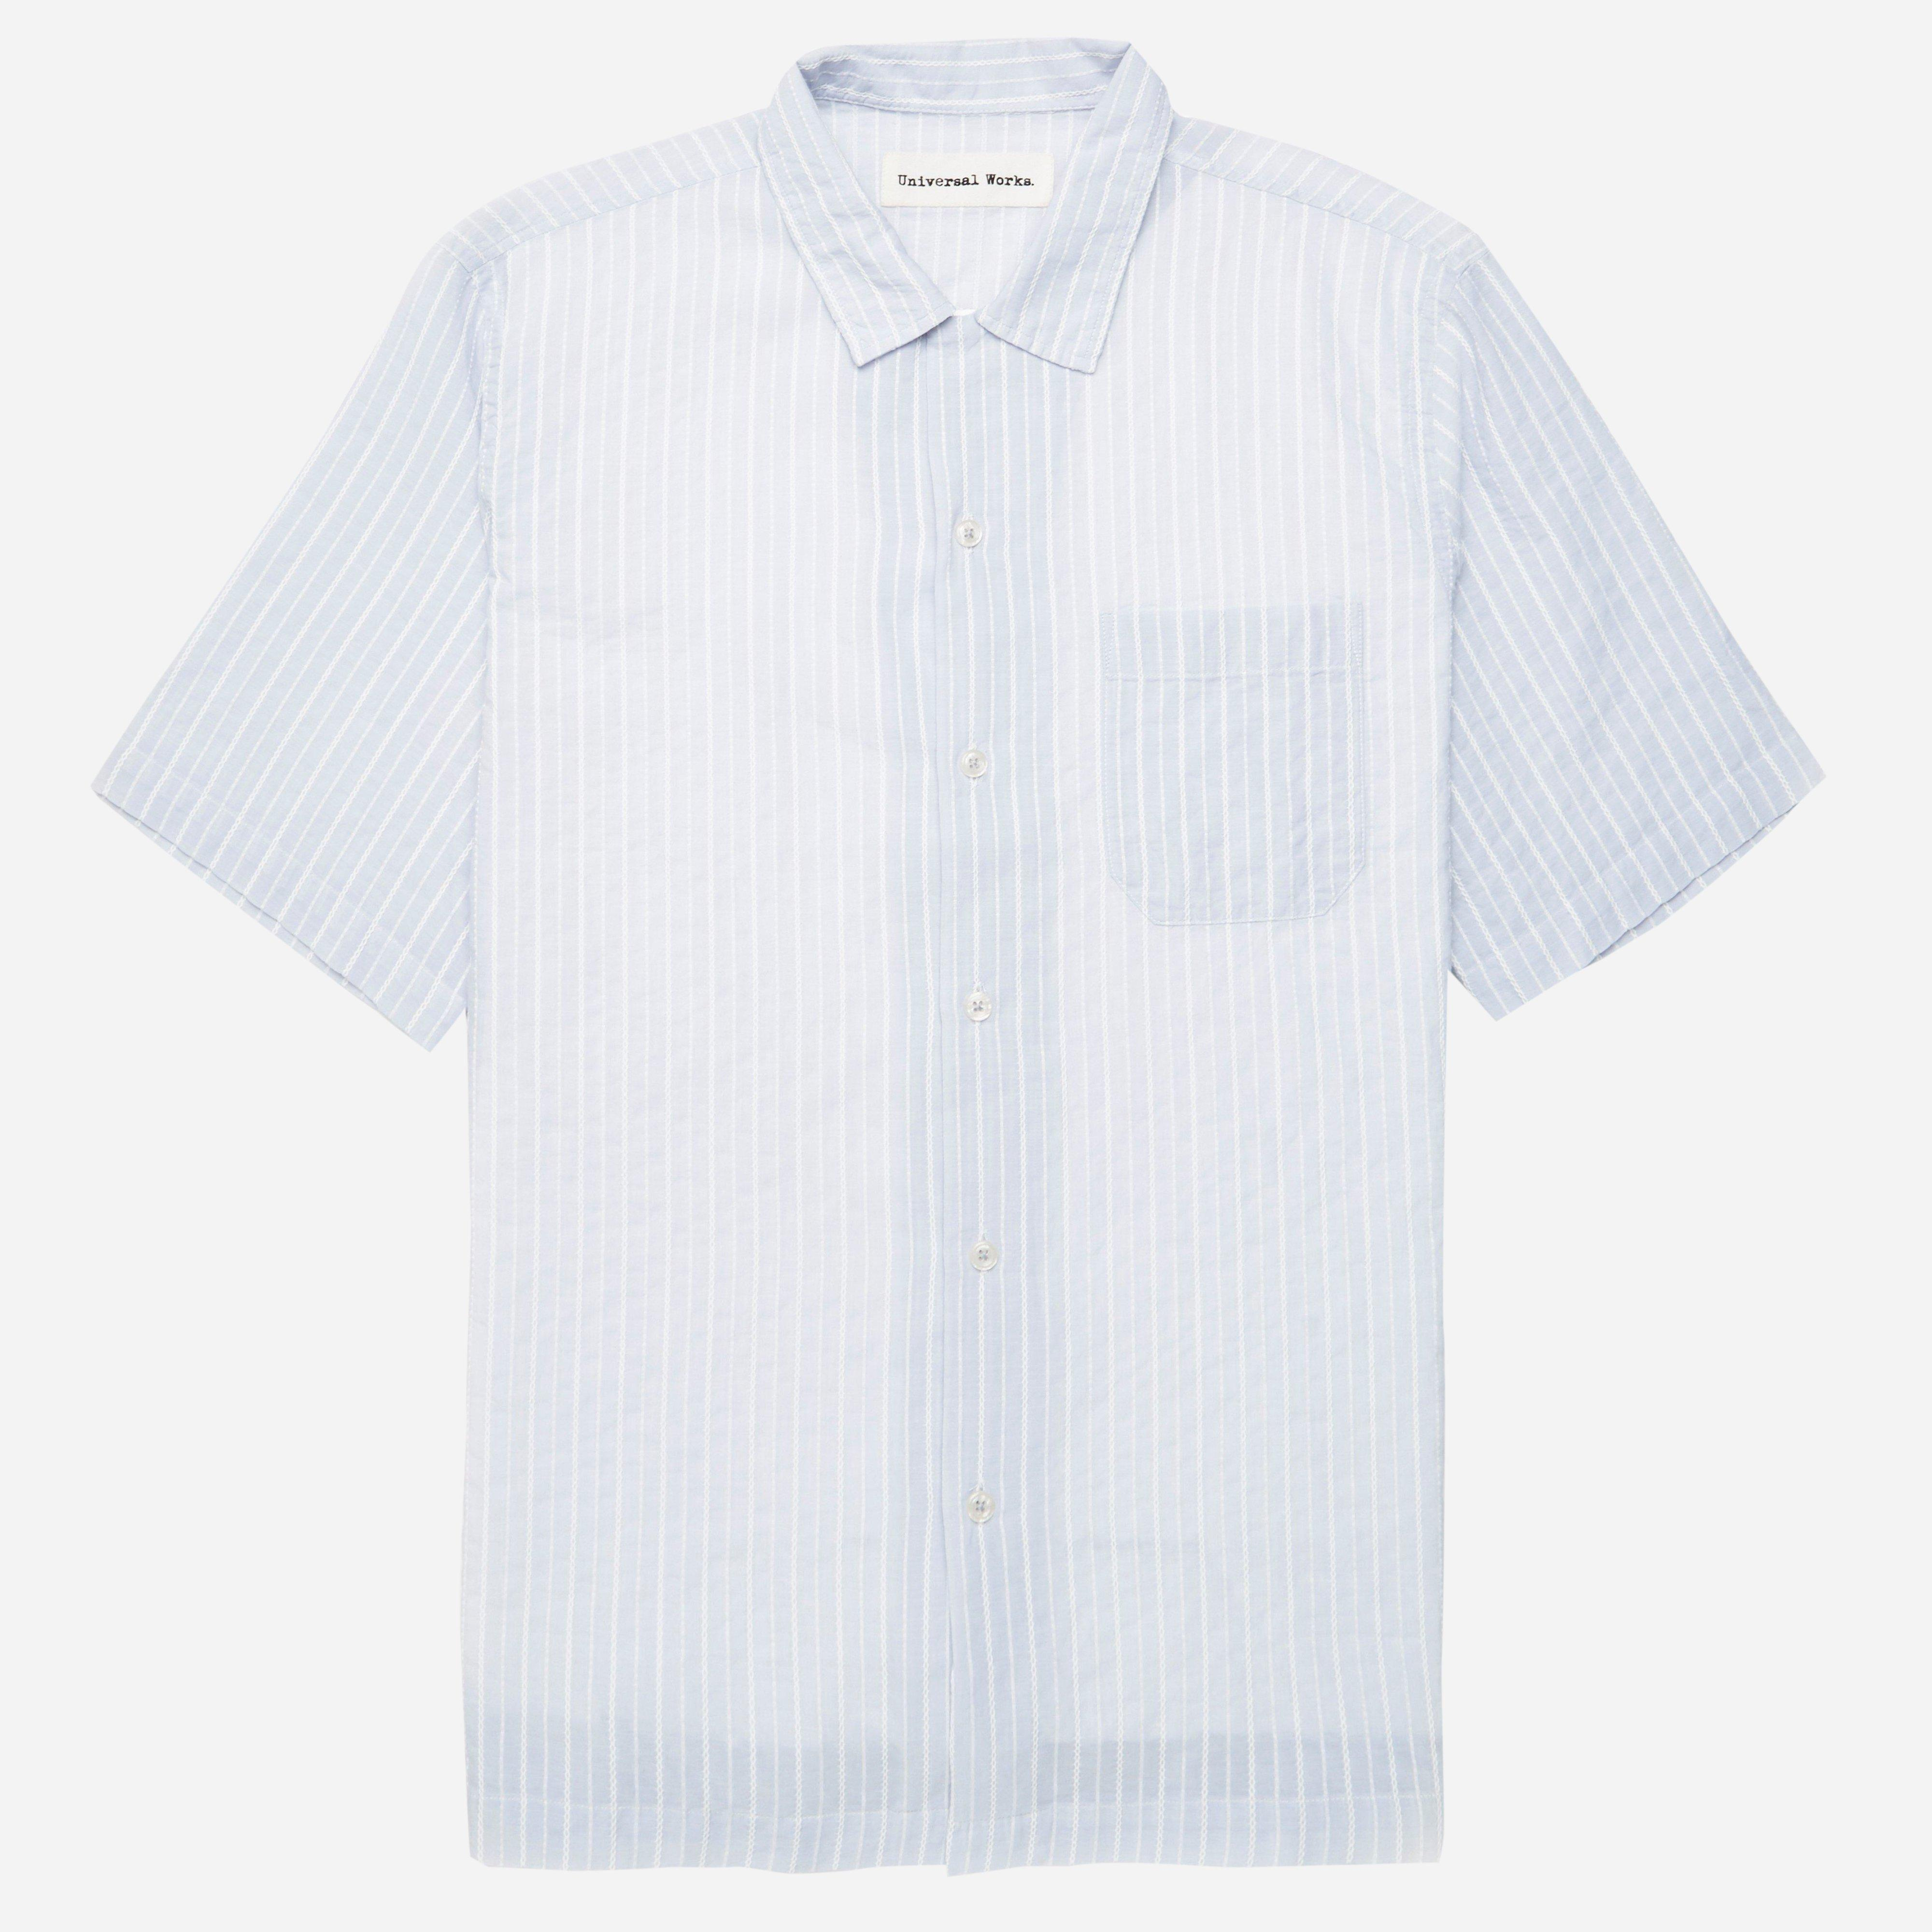 Universal Works Havana Stripe Road Shirt